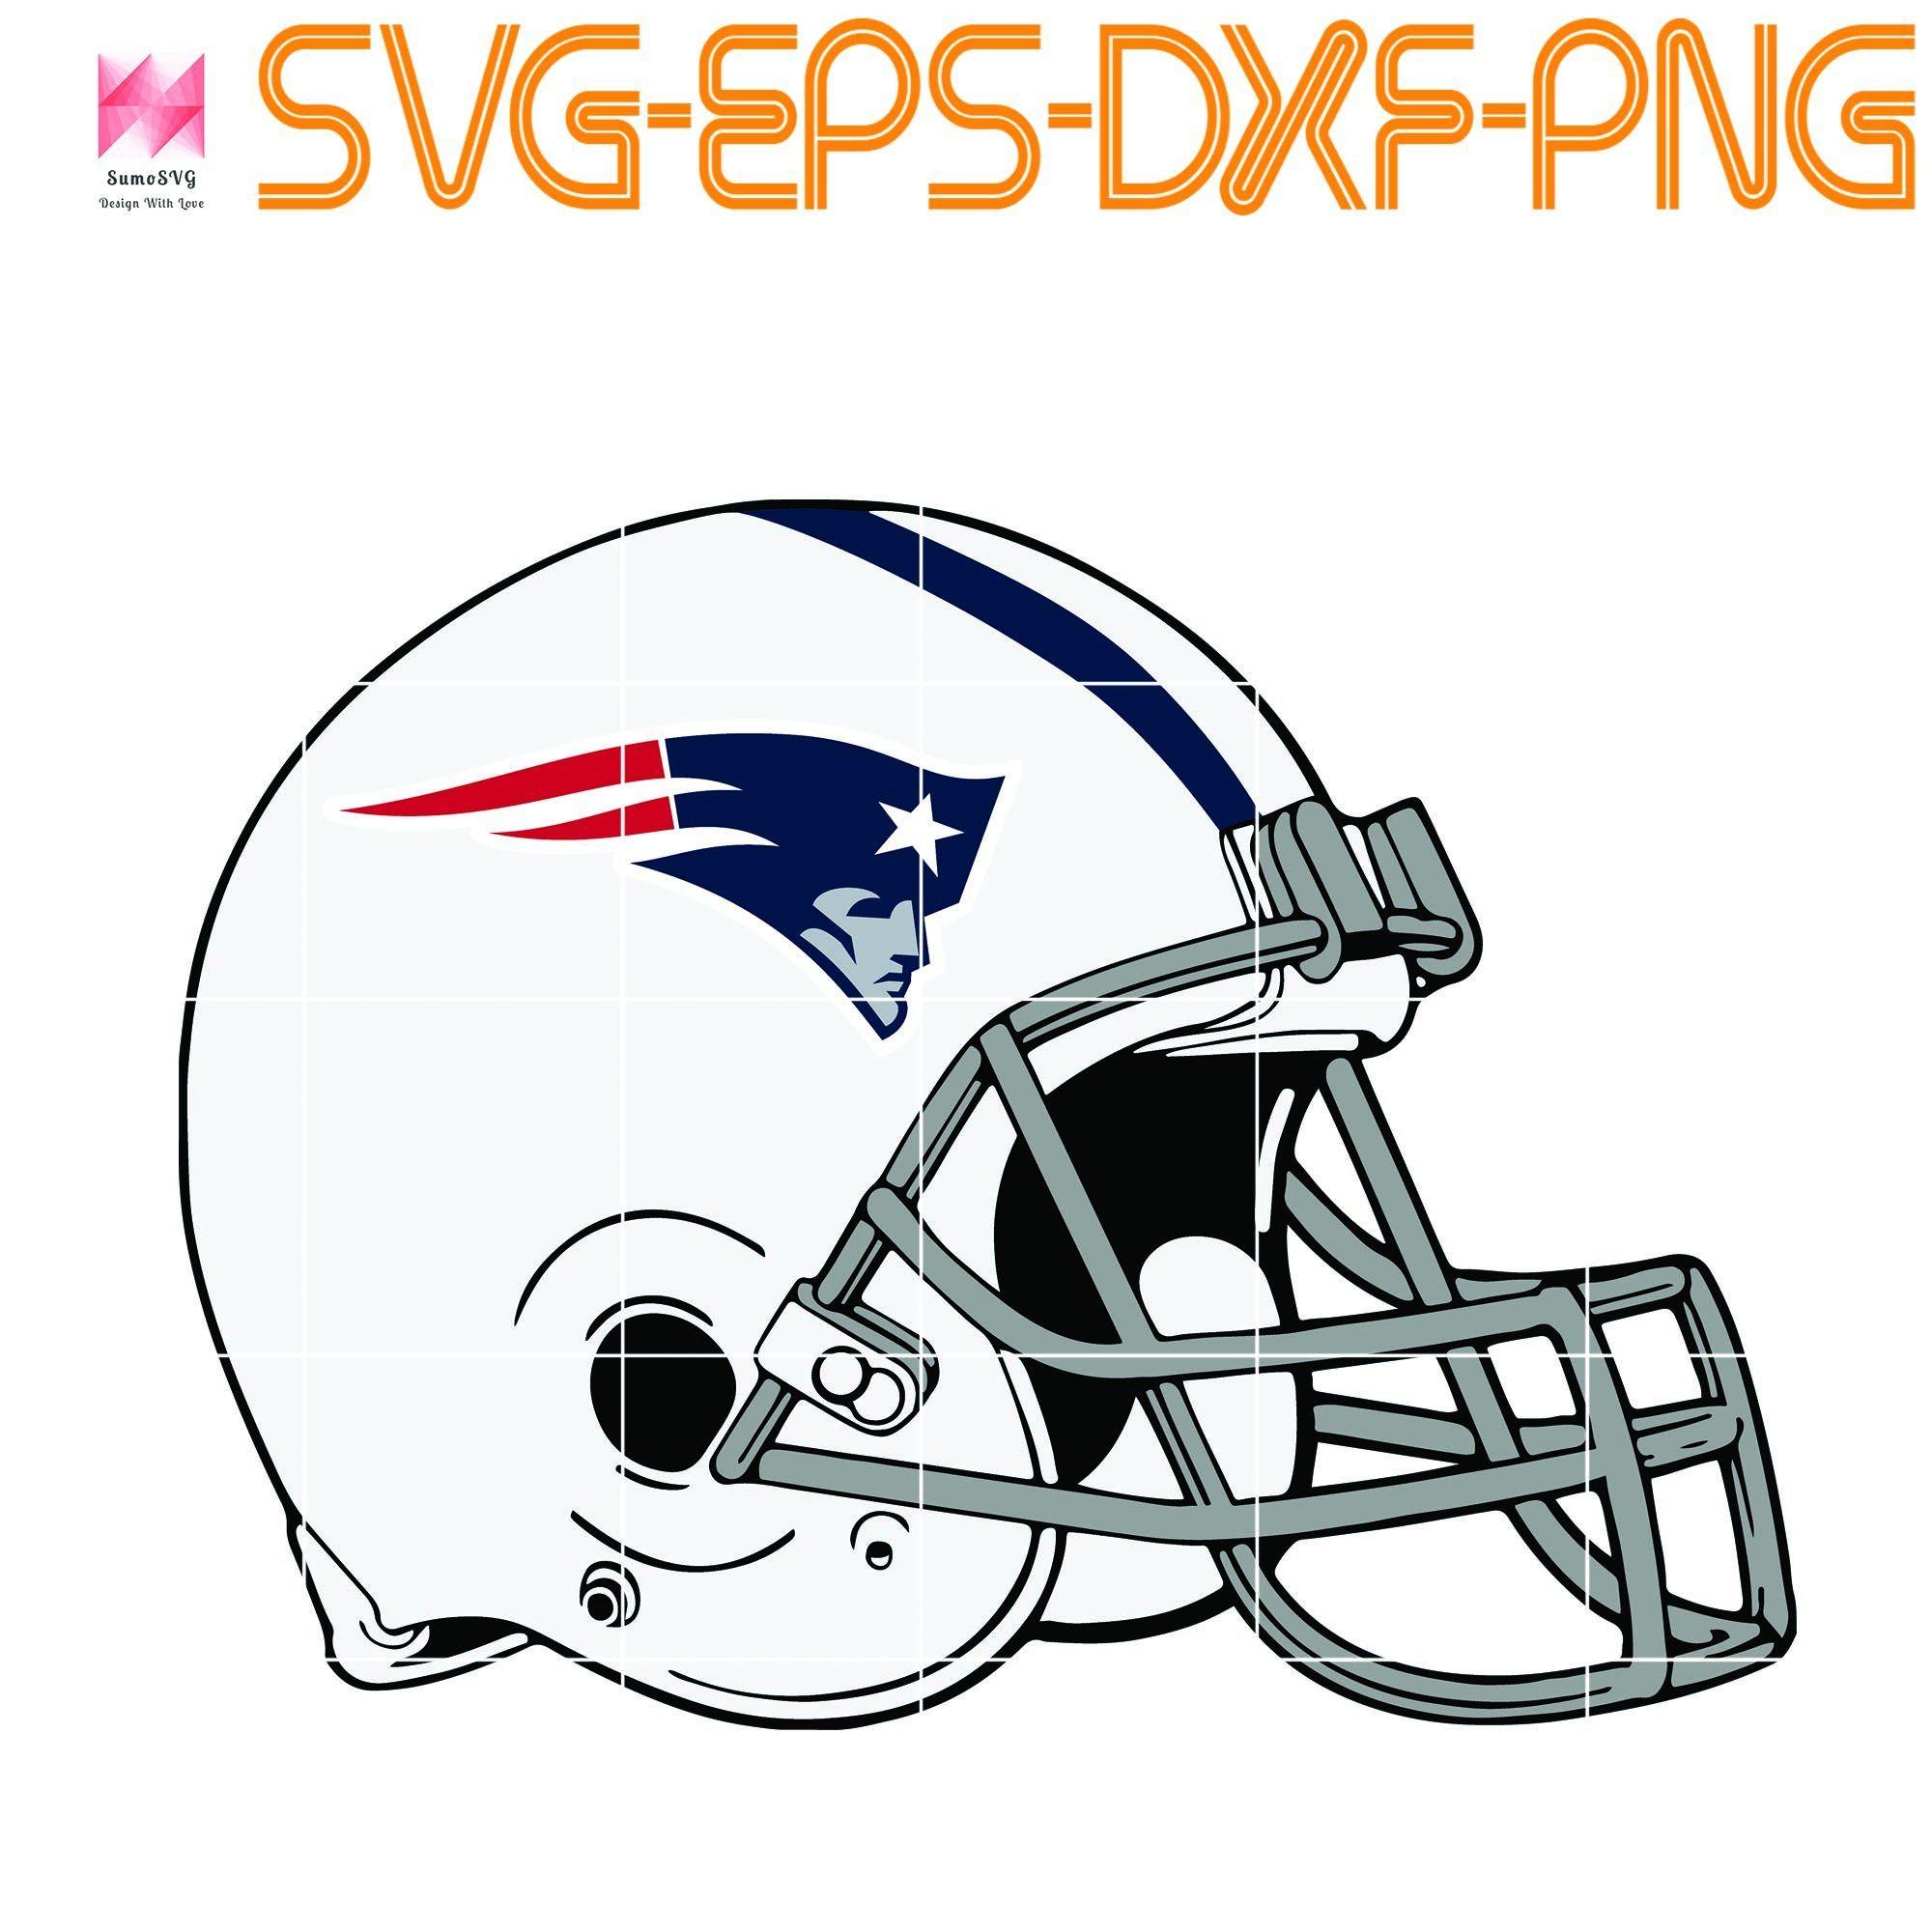 Ghim Tren New England Patriots Svg Png Eps Dxf Digital